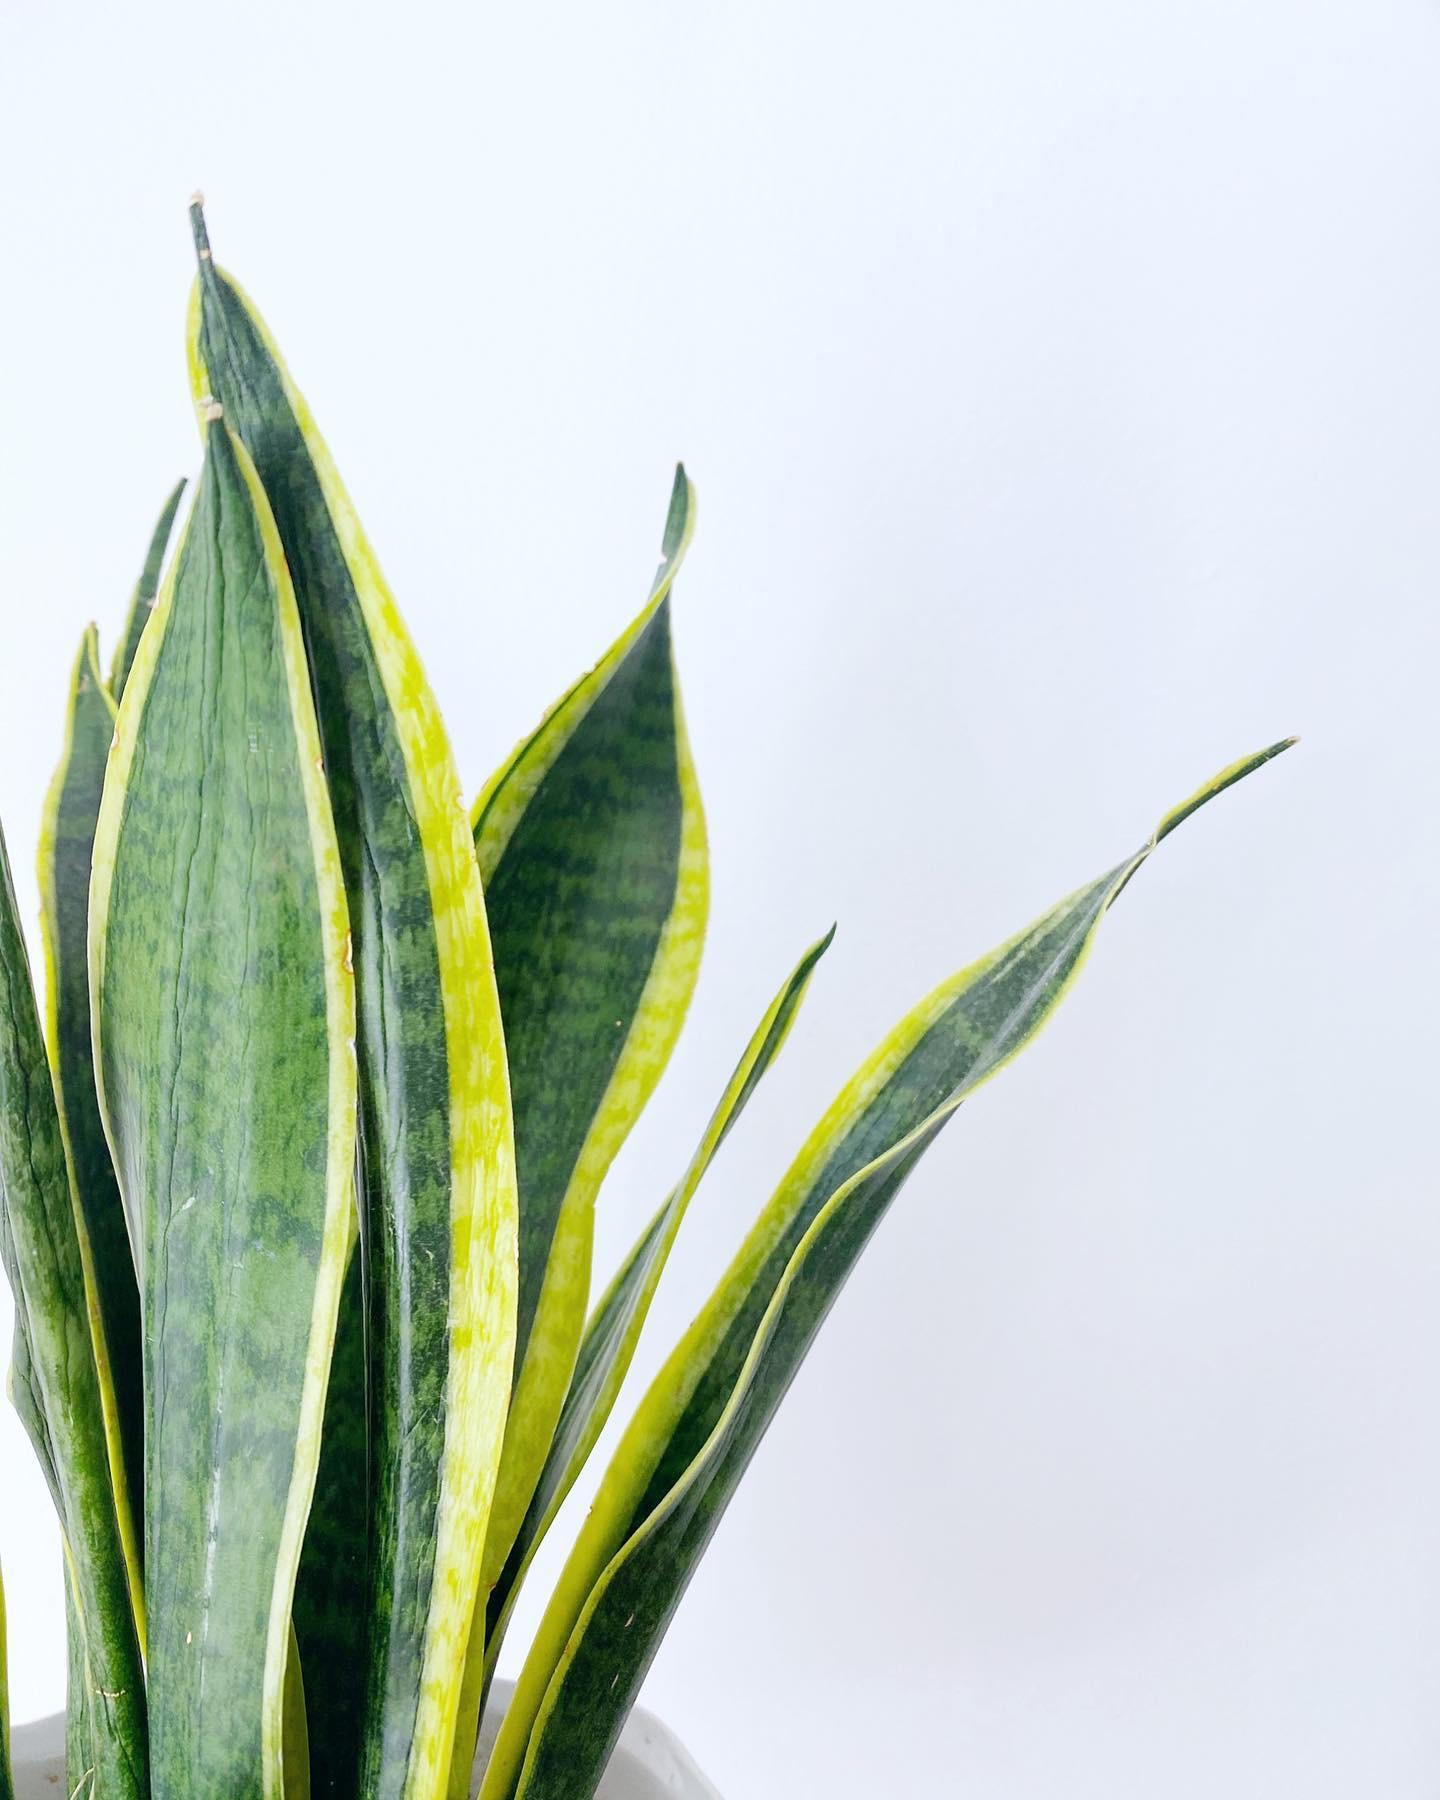 10 Shade Tolerant Plants You Will Love